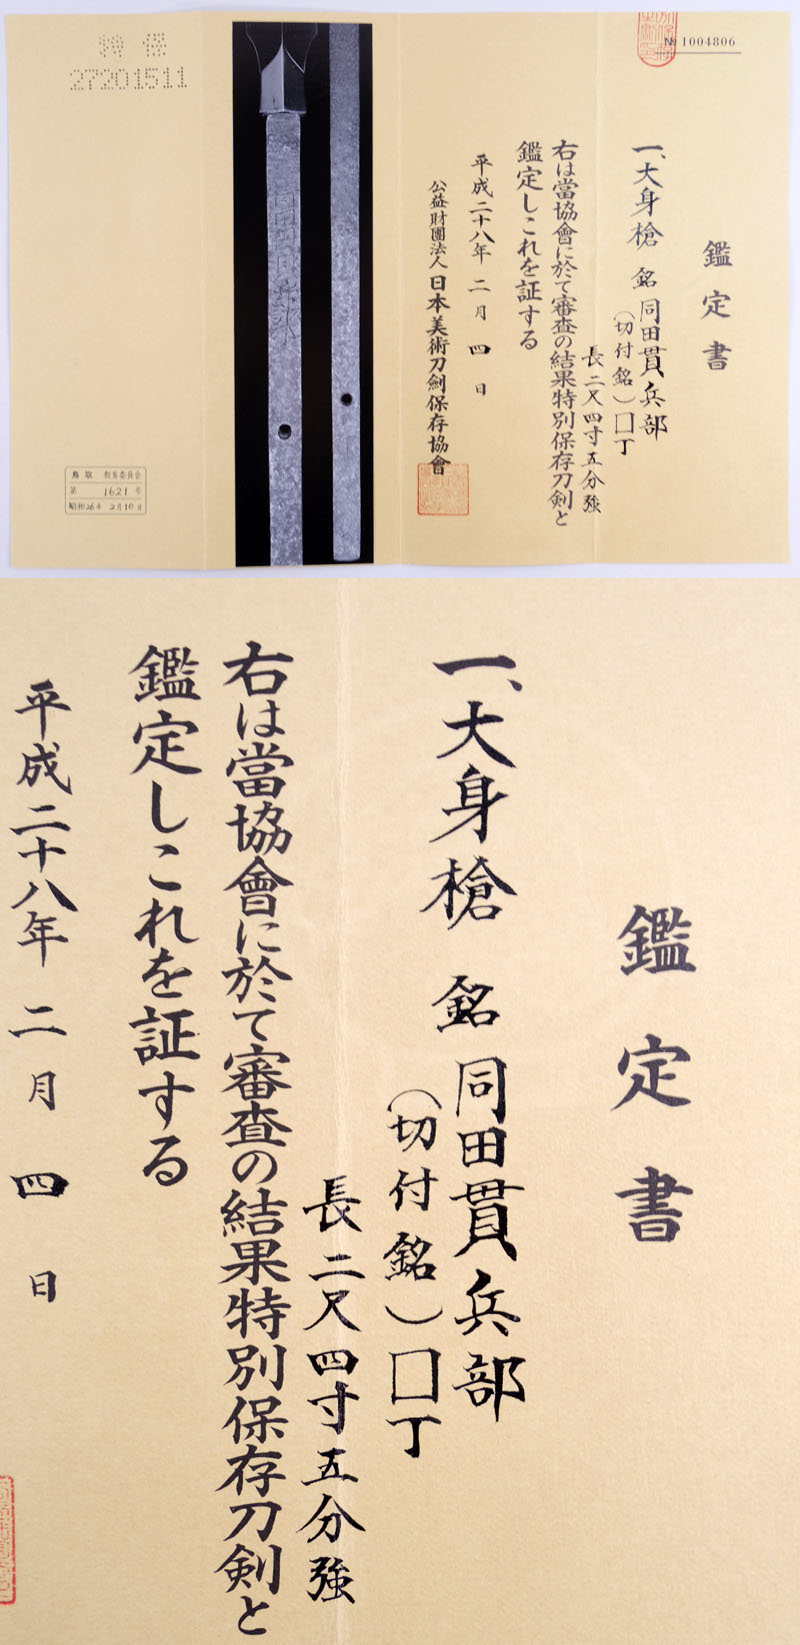 同田貫兵部 Picture of Certificate